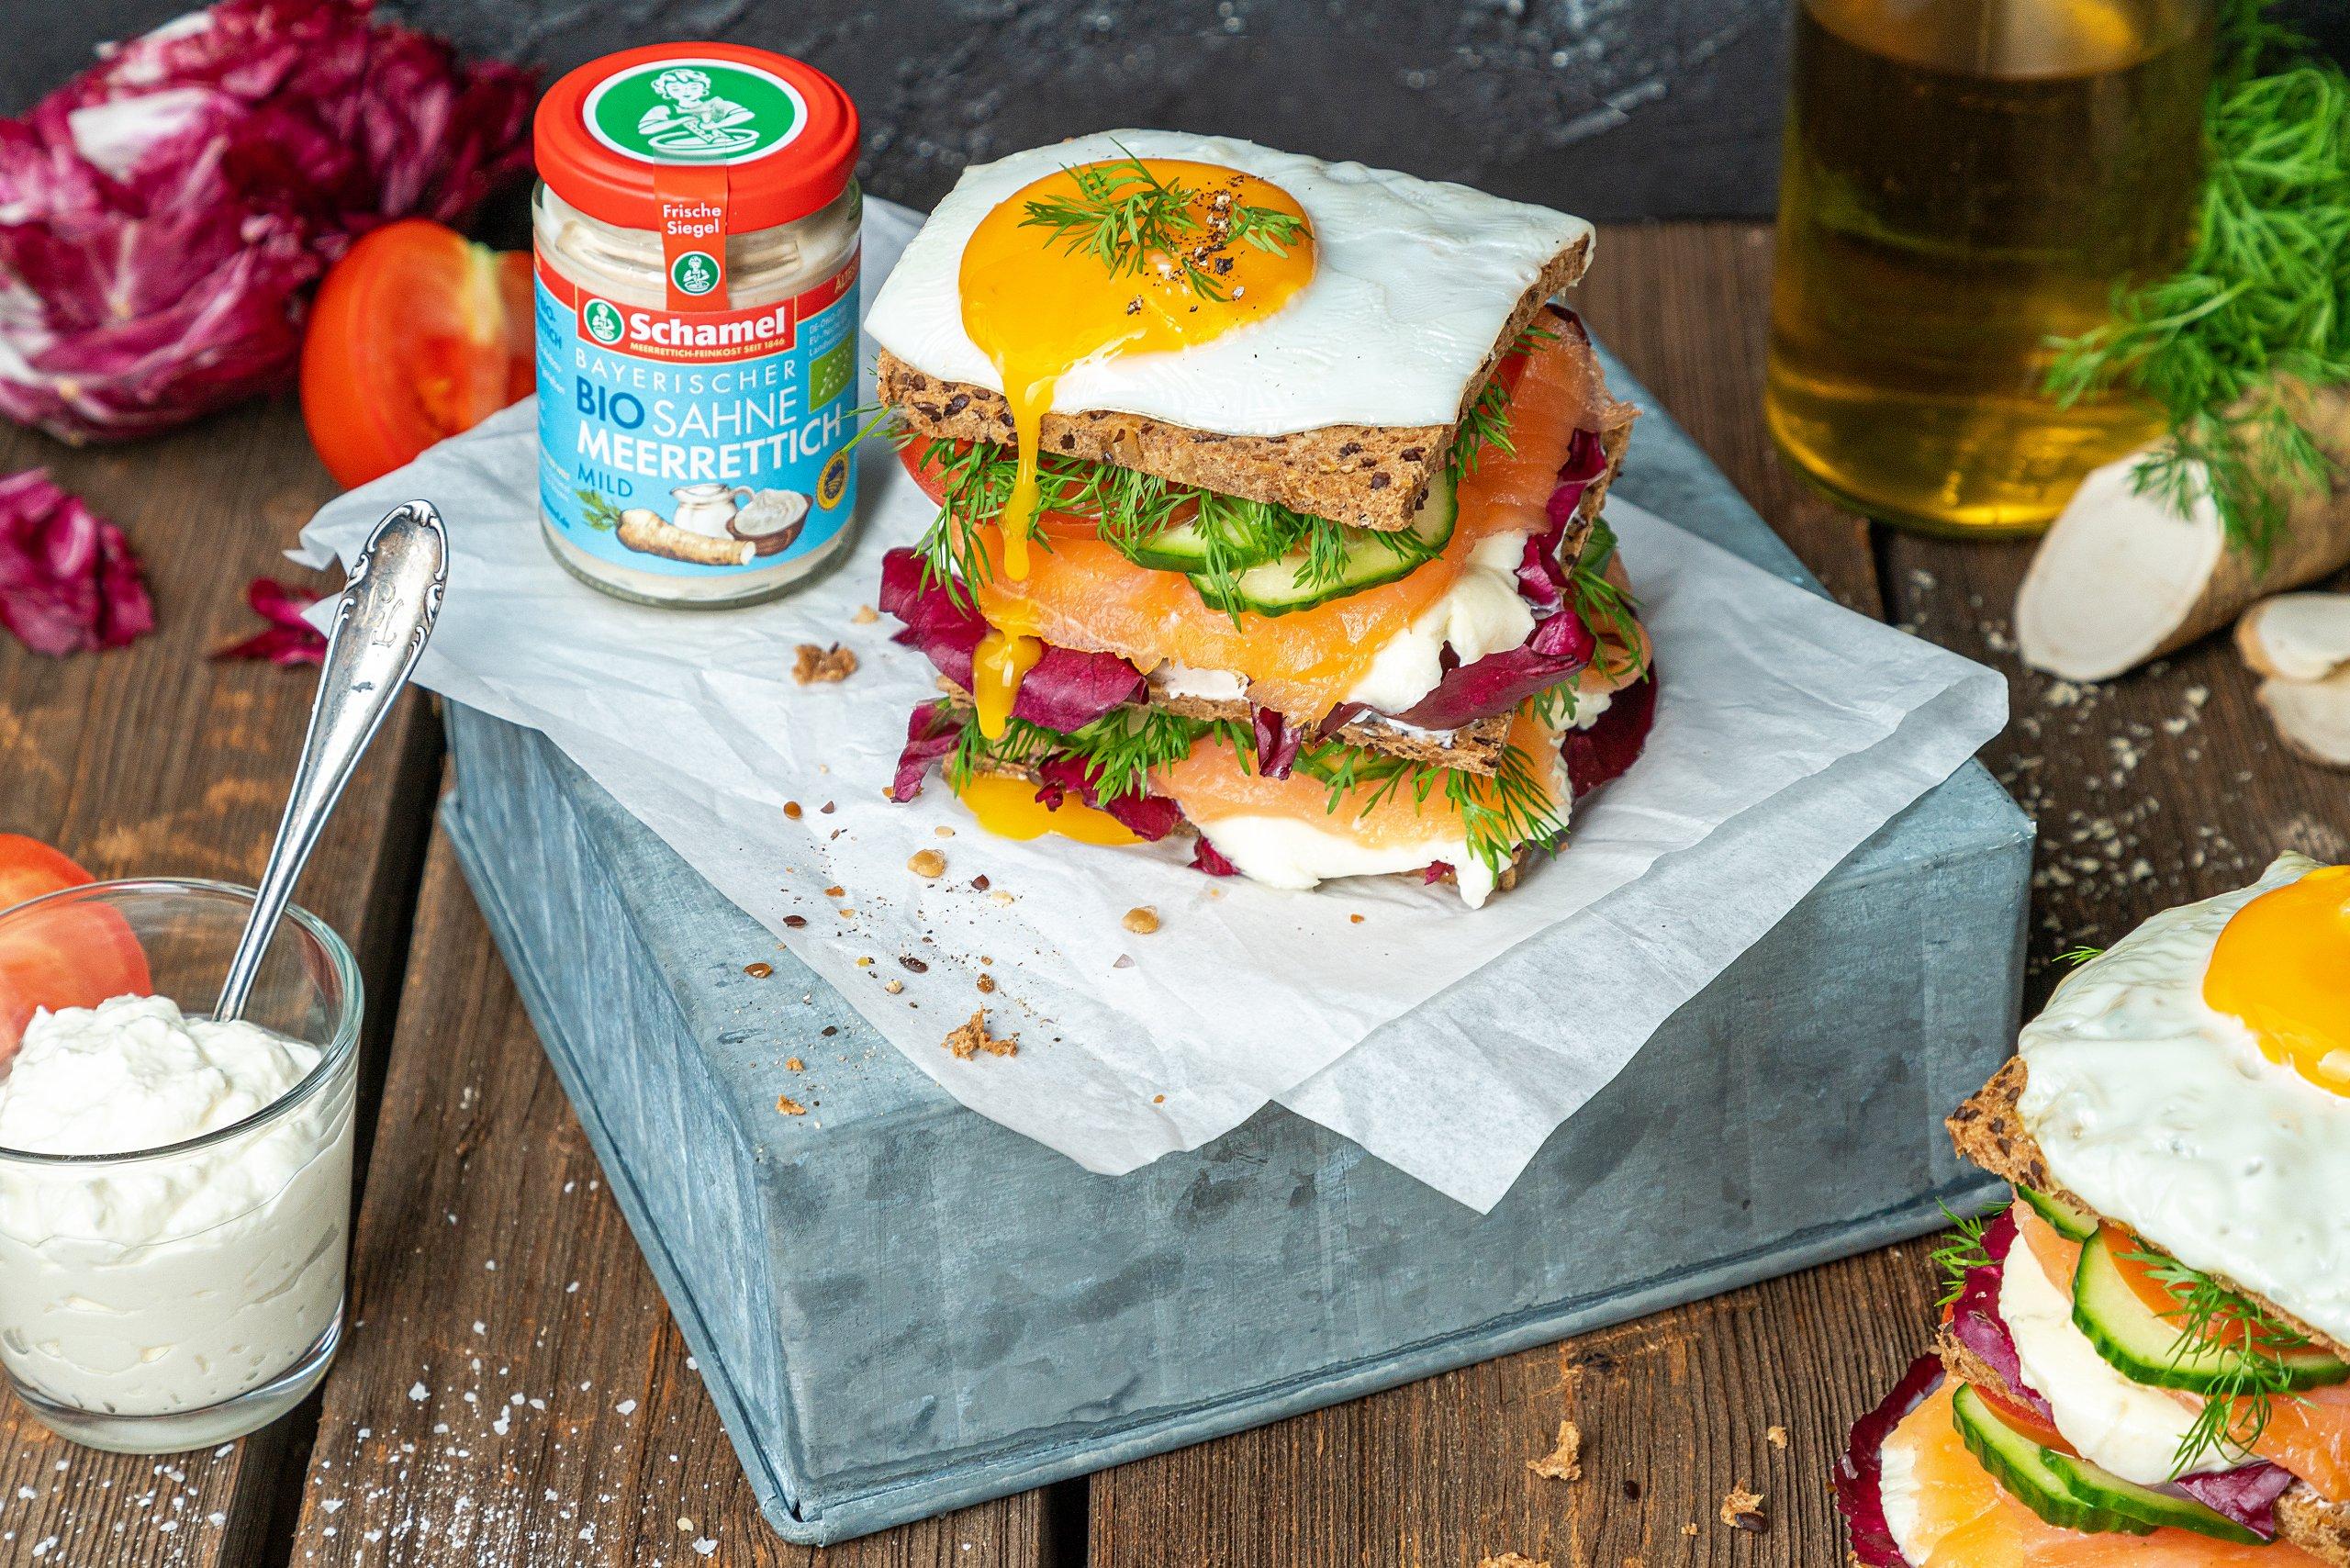 Räucherlachs-Skyrella-Sandwich